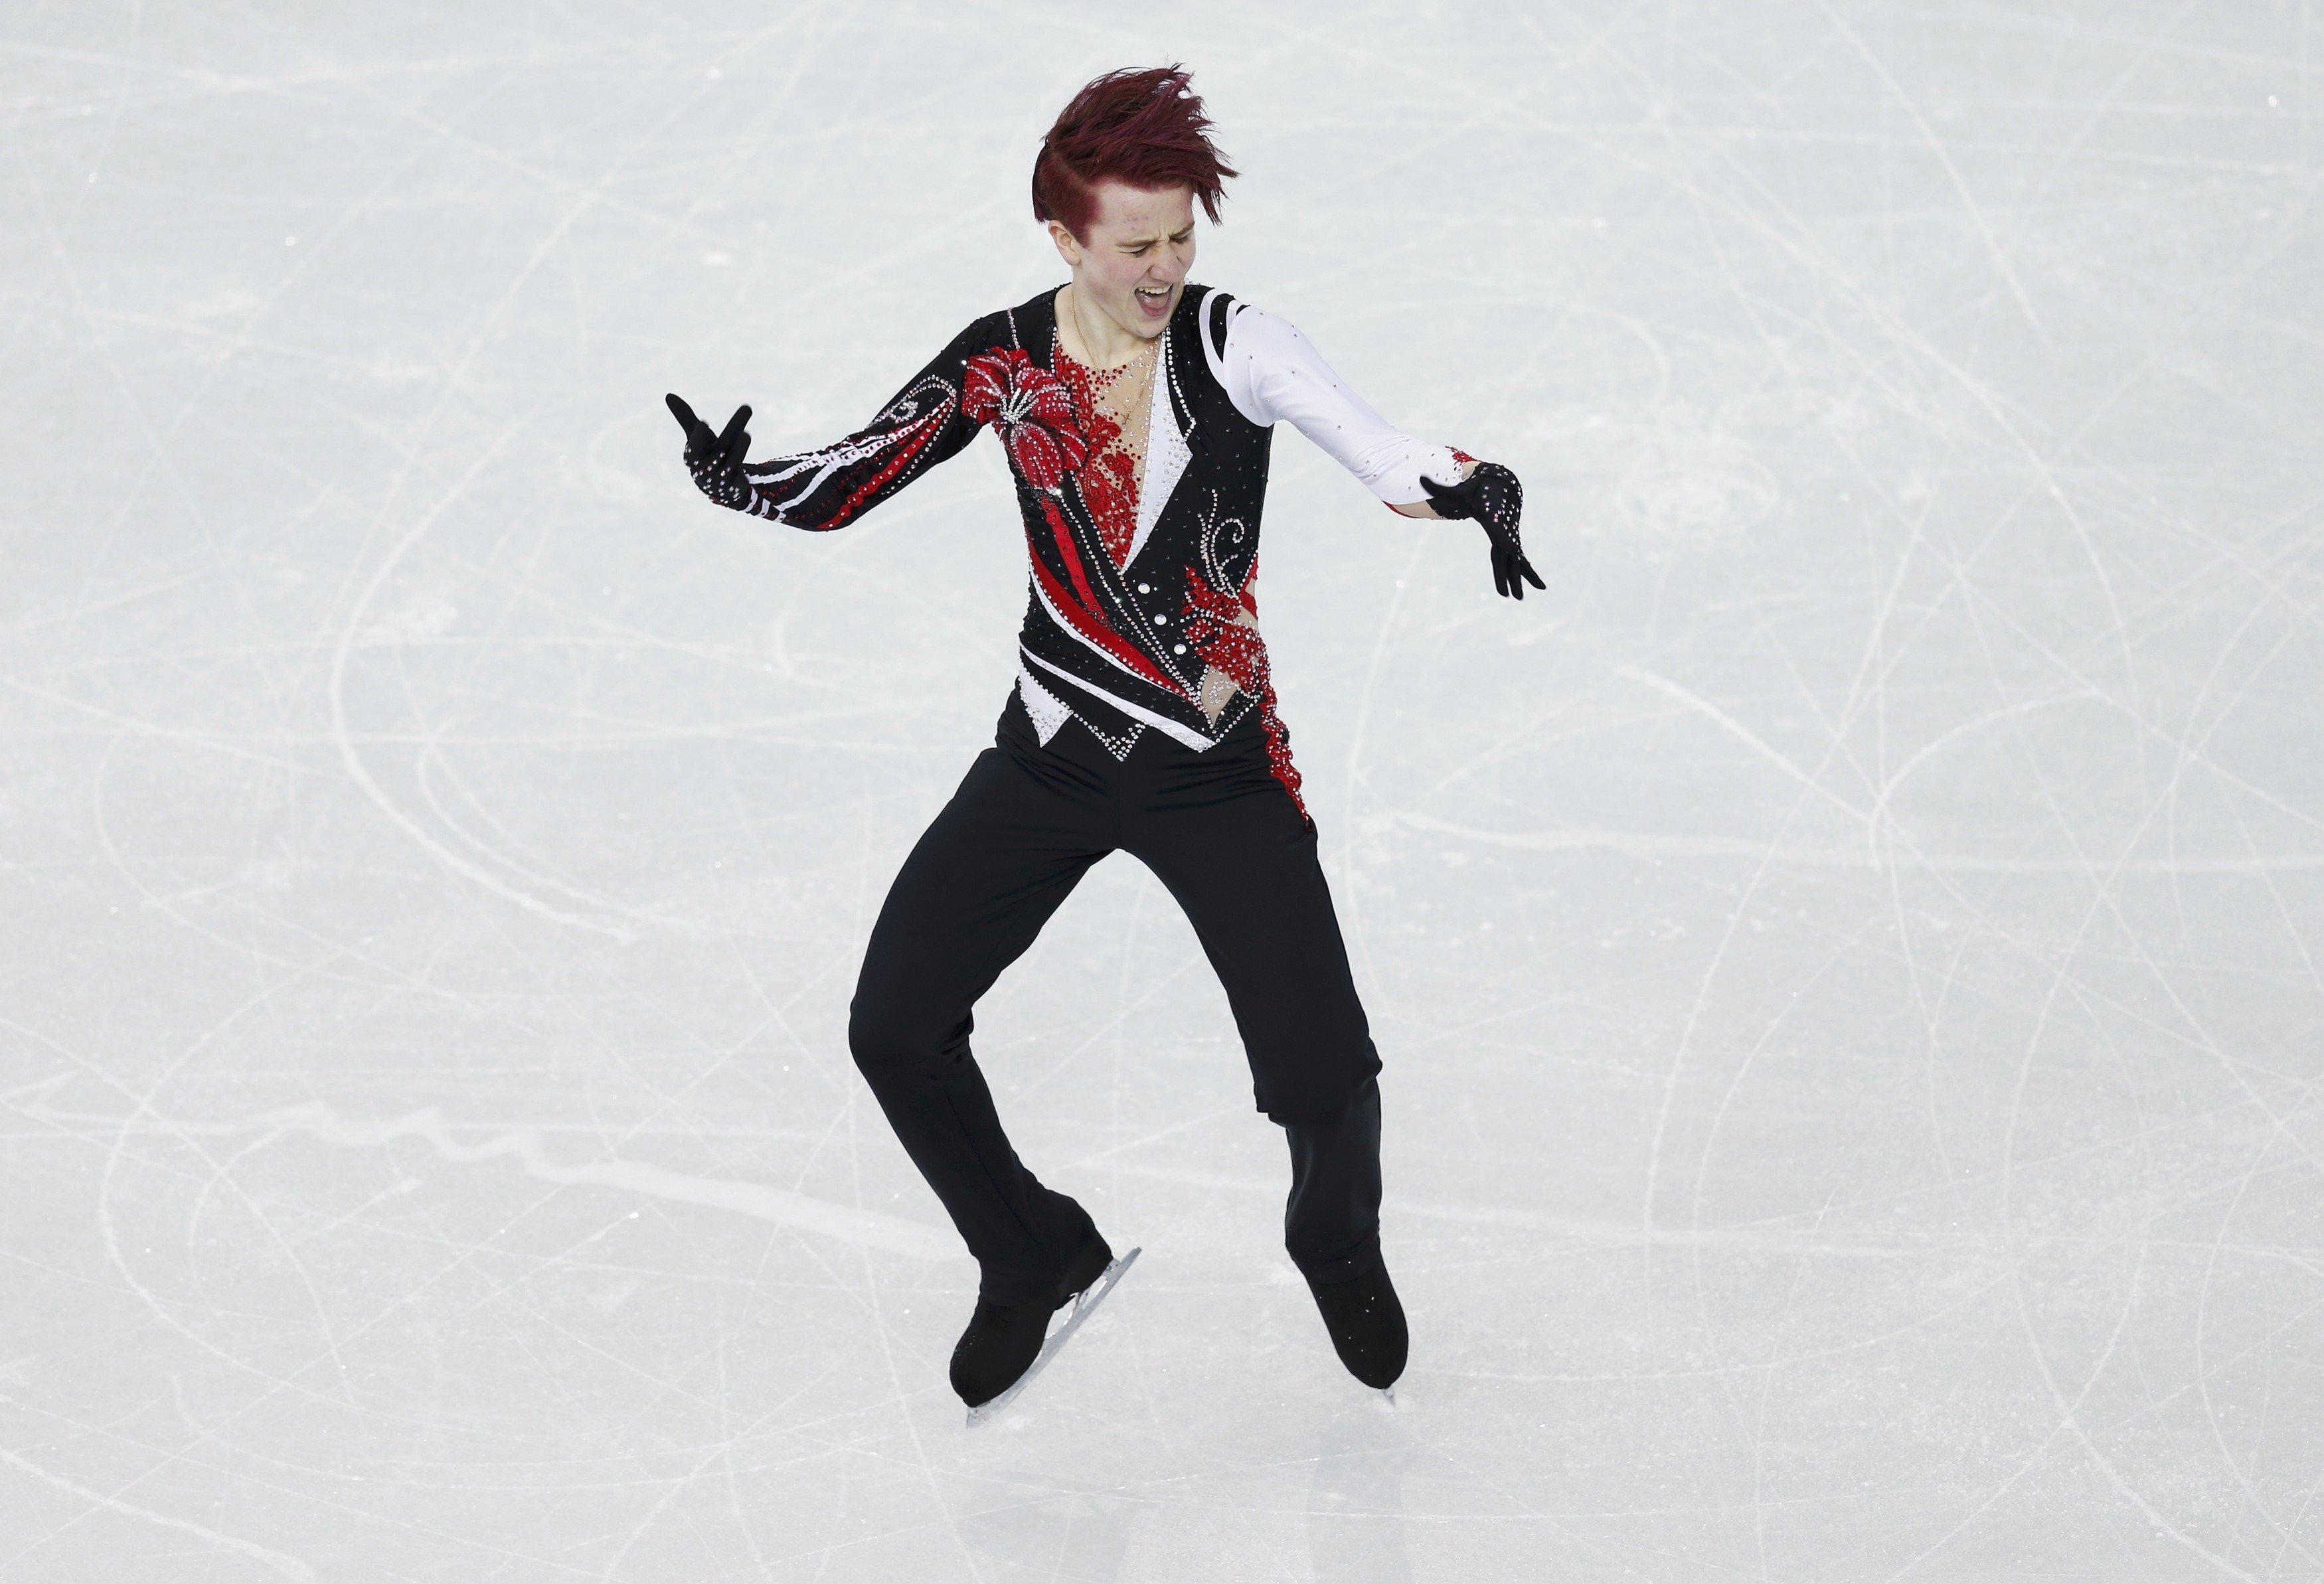 Uzbekistan's Misha Ge competes during the Figure Skating Men's Free Skating Program.